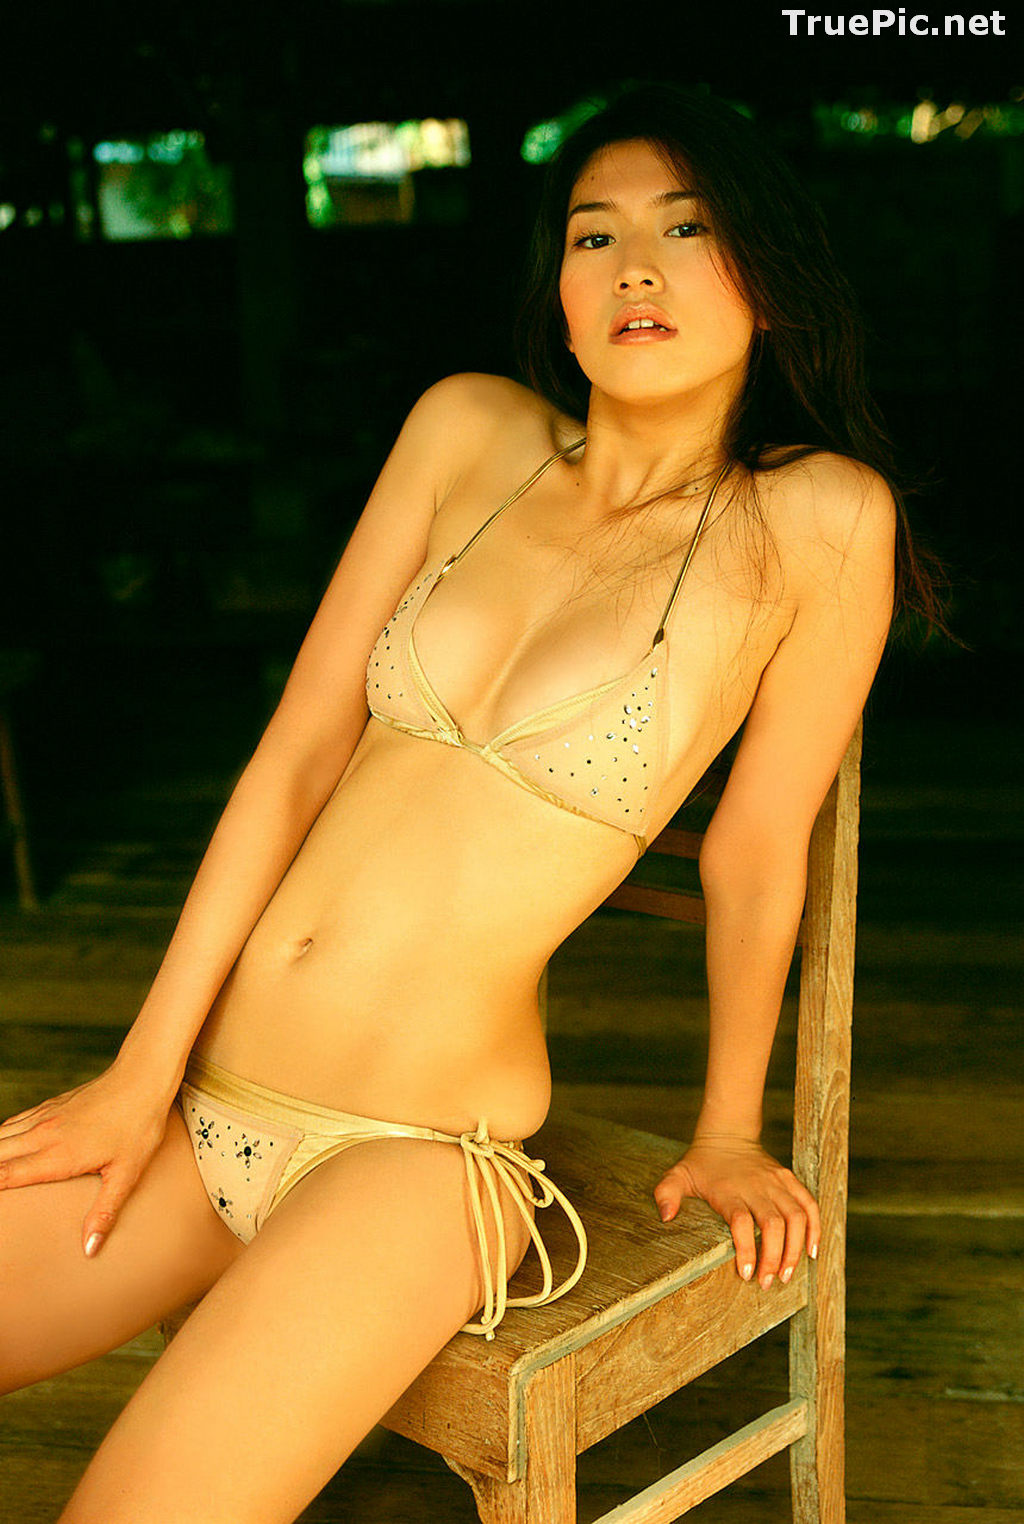 Image Japanese Gravure Idol - Chisato Morishita - Paradise Of Eros Photo - TruePic.net - Picture-10